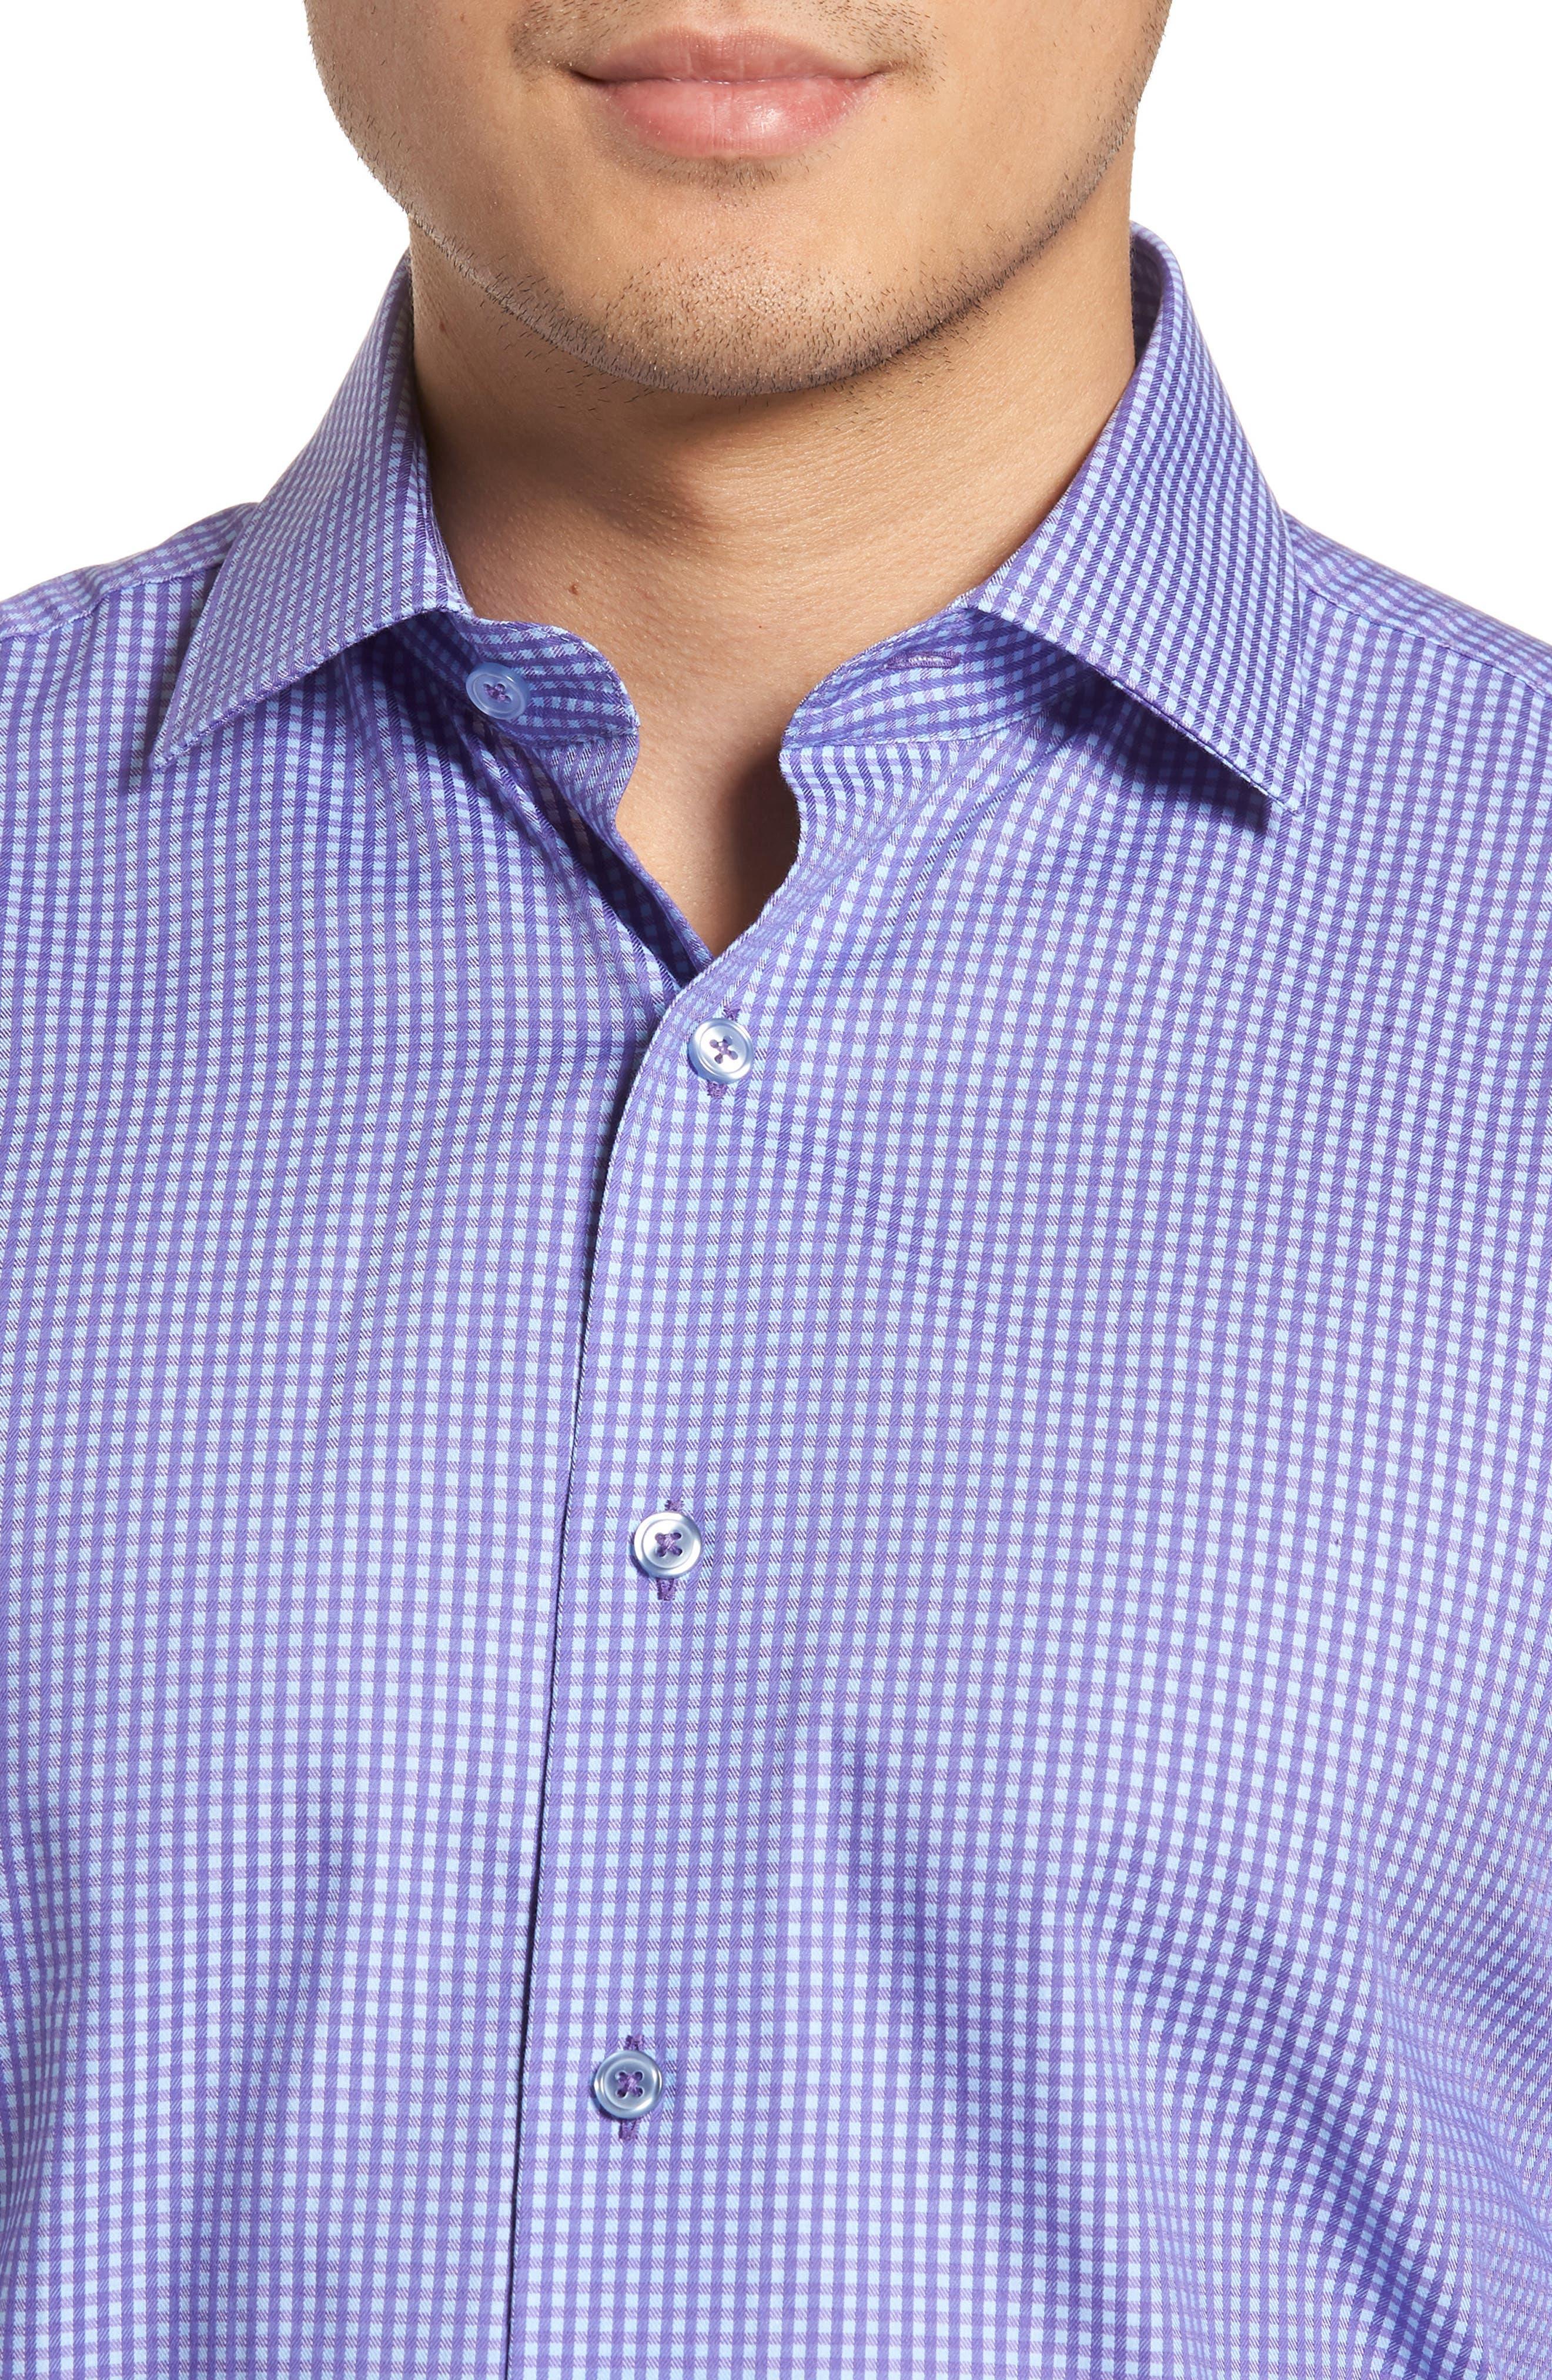 LORENZO UOMO,                             Trim Fit Mini Check Dress Shirt,                             Alternate thumbnail 2, color,                             510